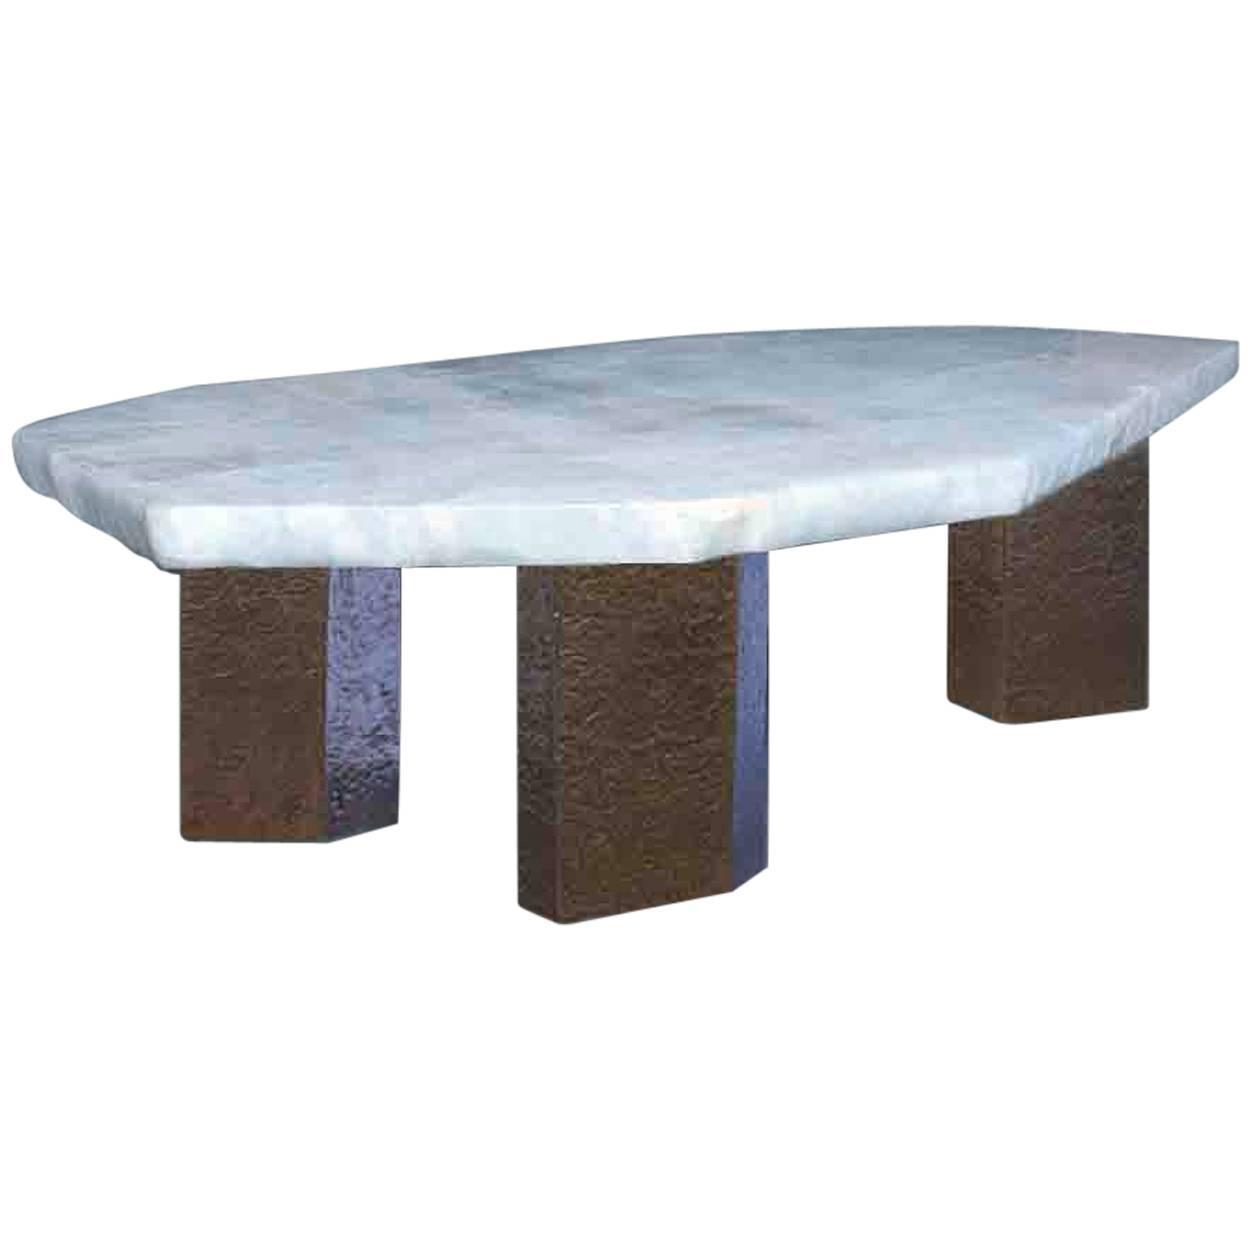 Polygon Form Rock Crystal Low Table Designed By Adam Fuks